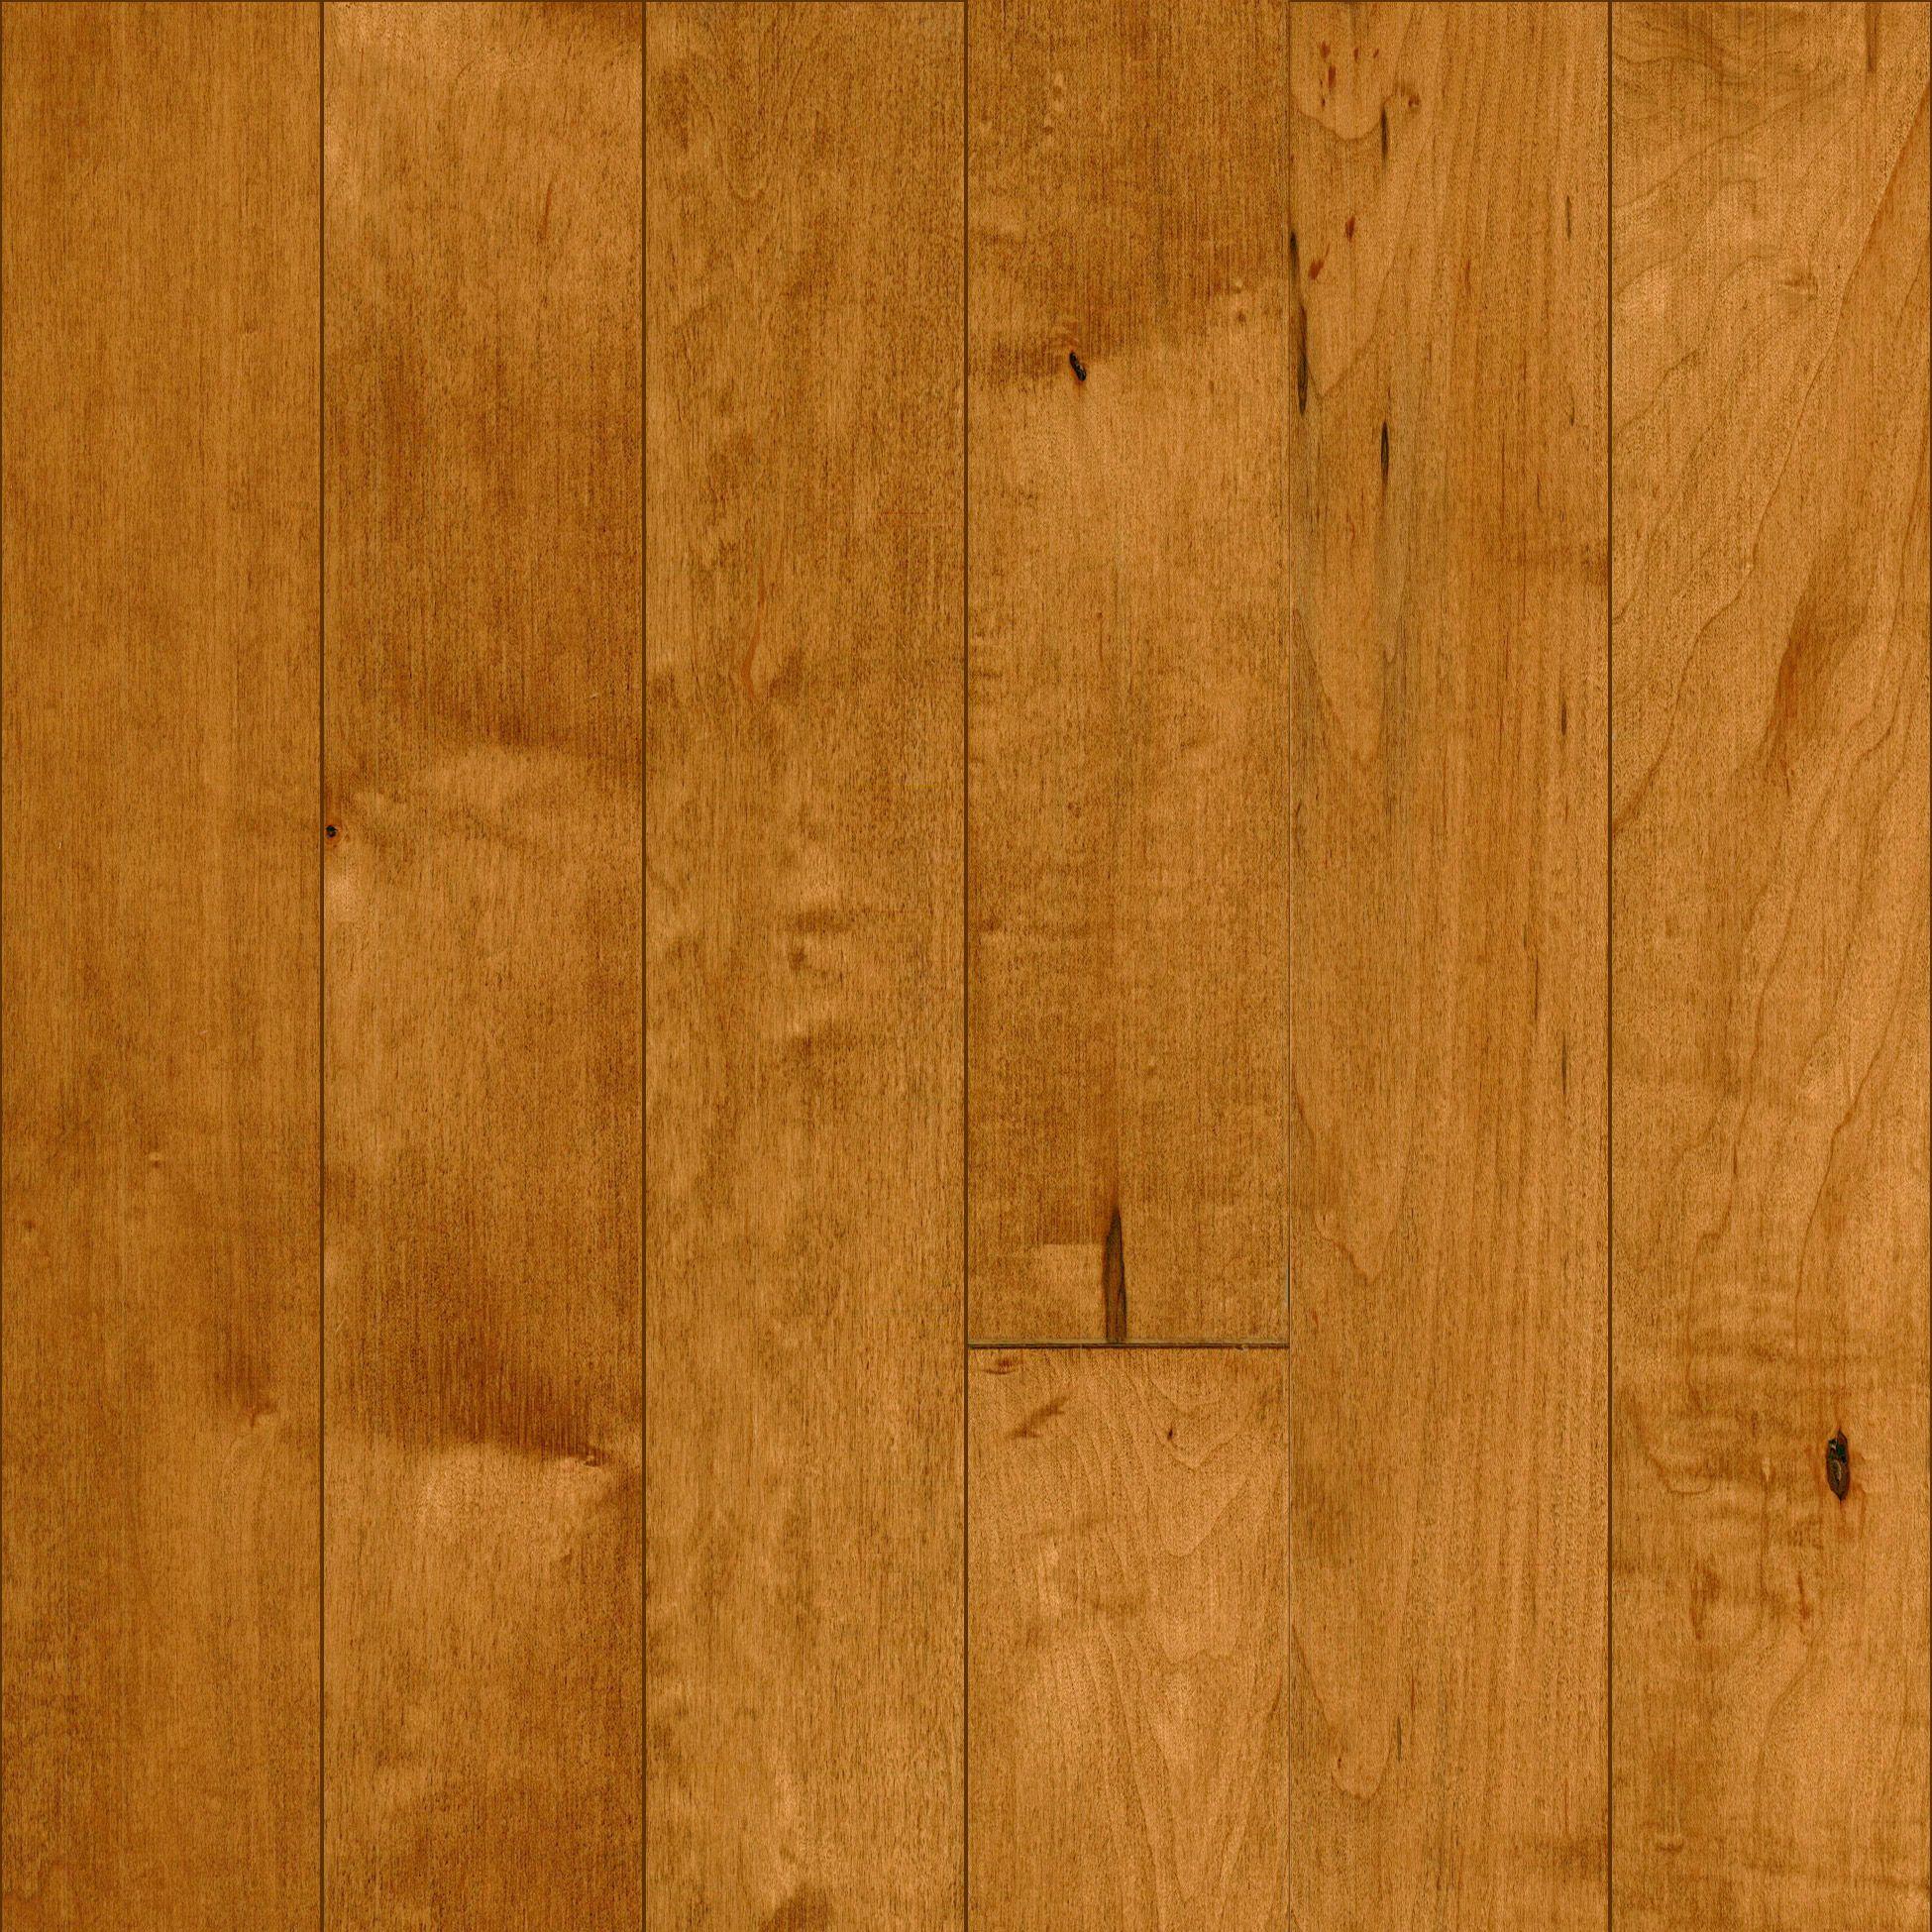 Maple Vanilla Hardwood Flooring Mk34528 24 Hardwood Floors Solid Hardwood Floors Flooring